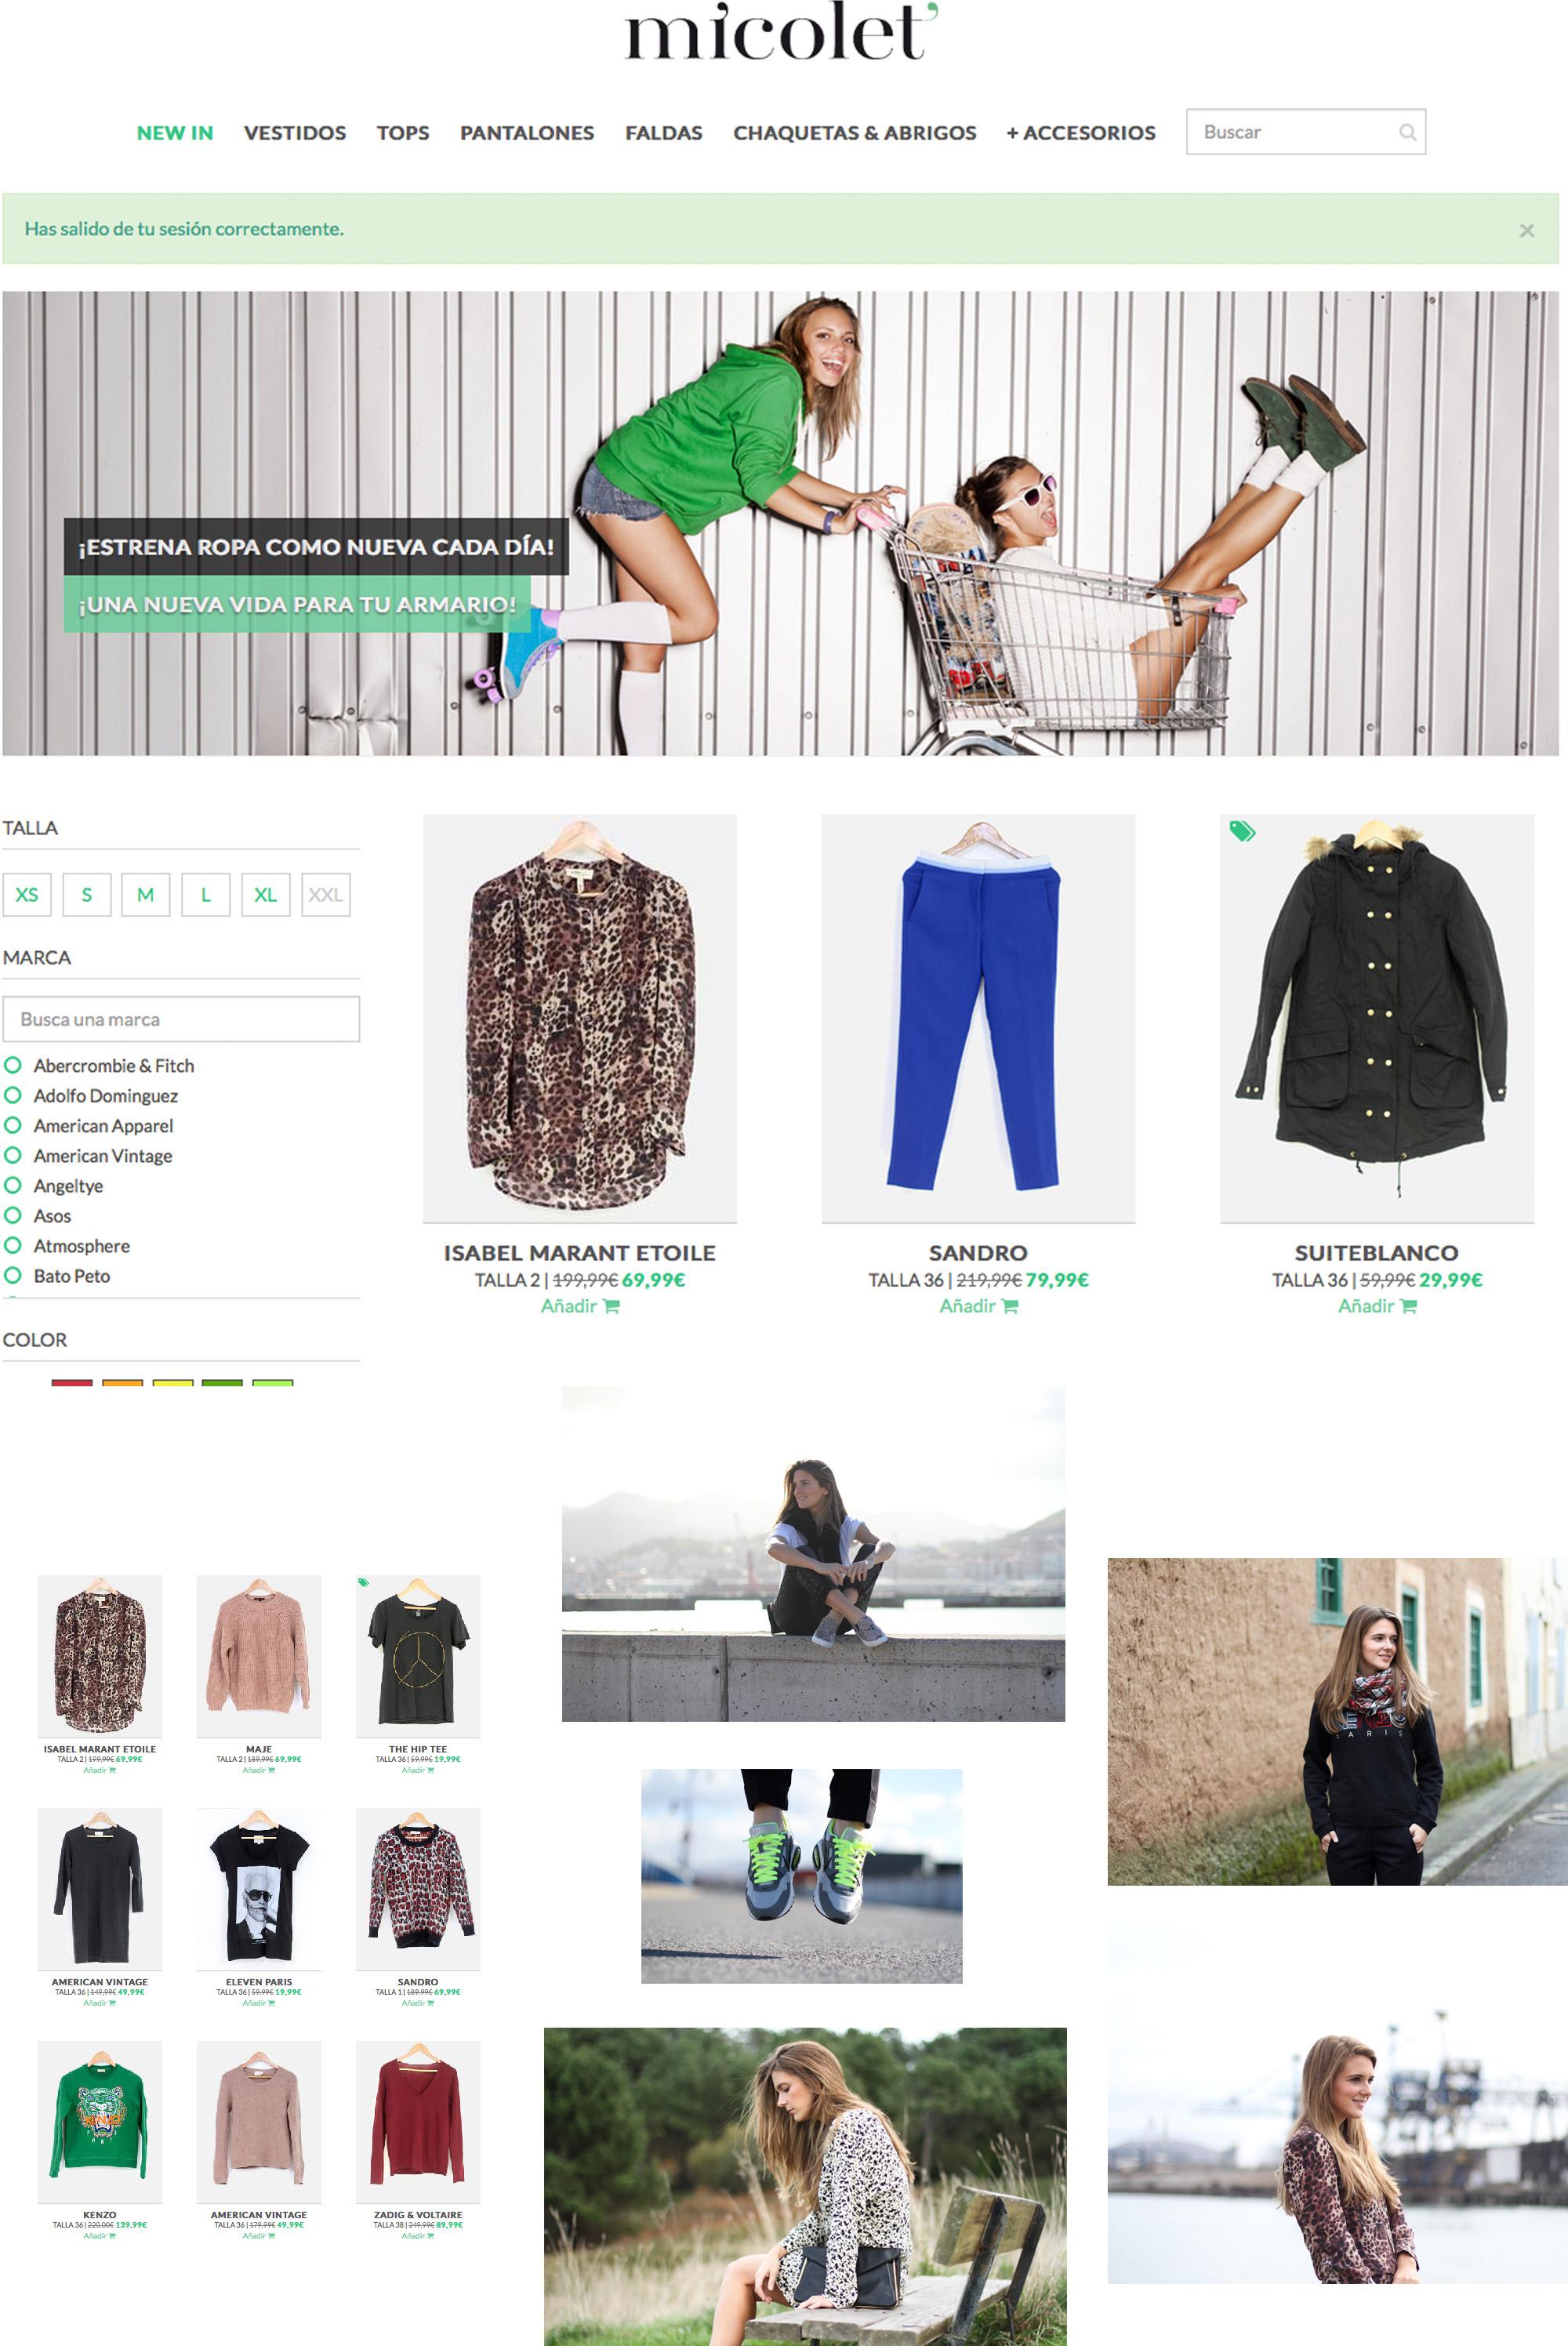 Clochet_shop_my_closet_micolet_04